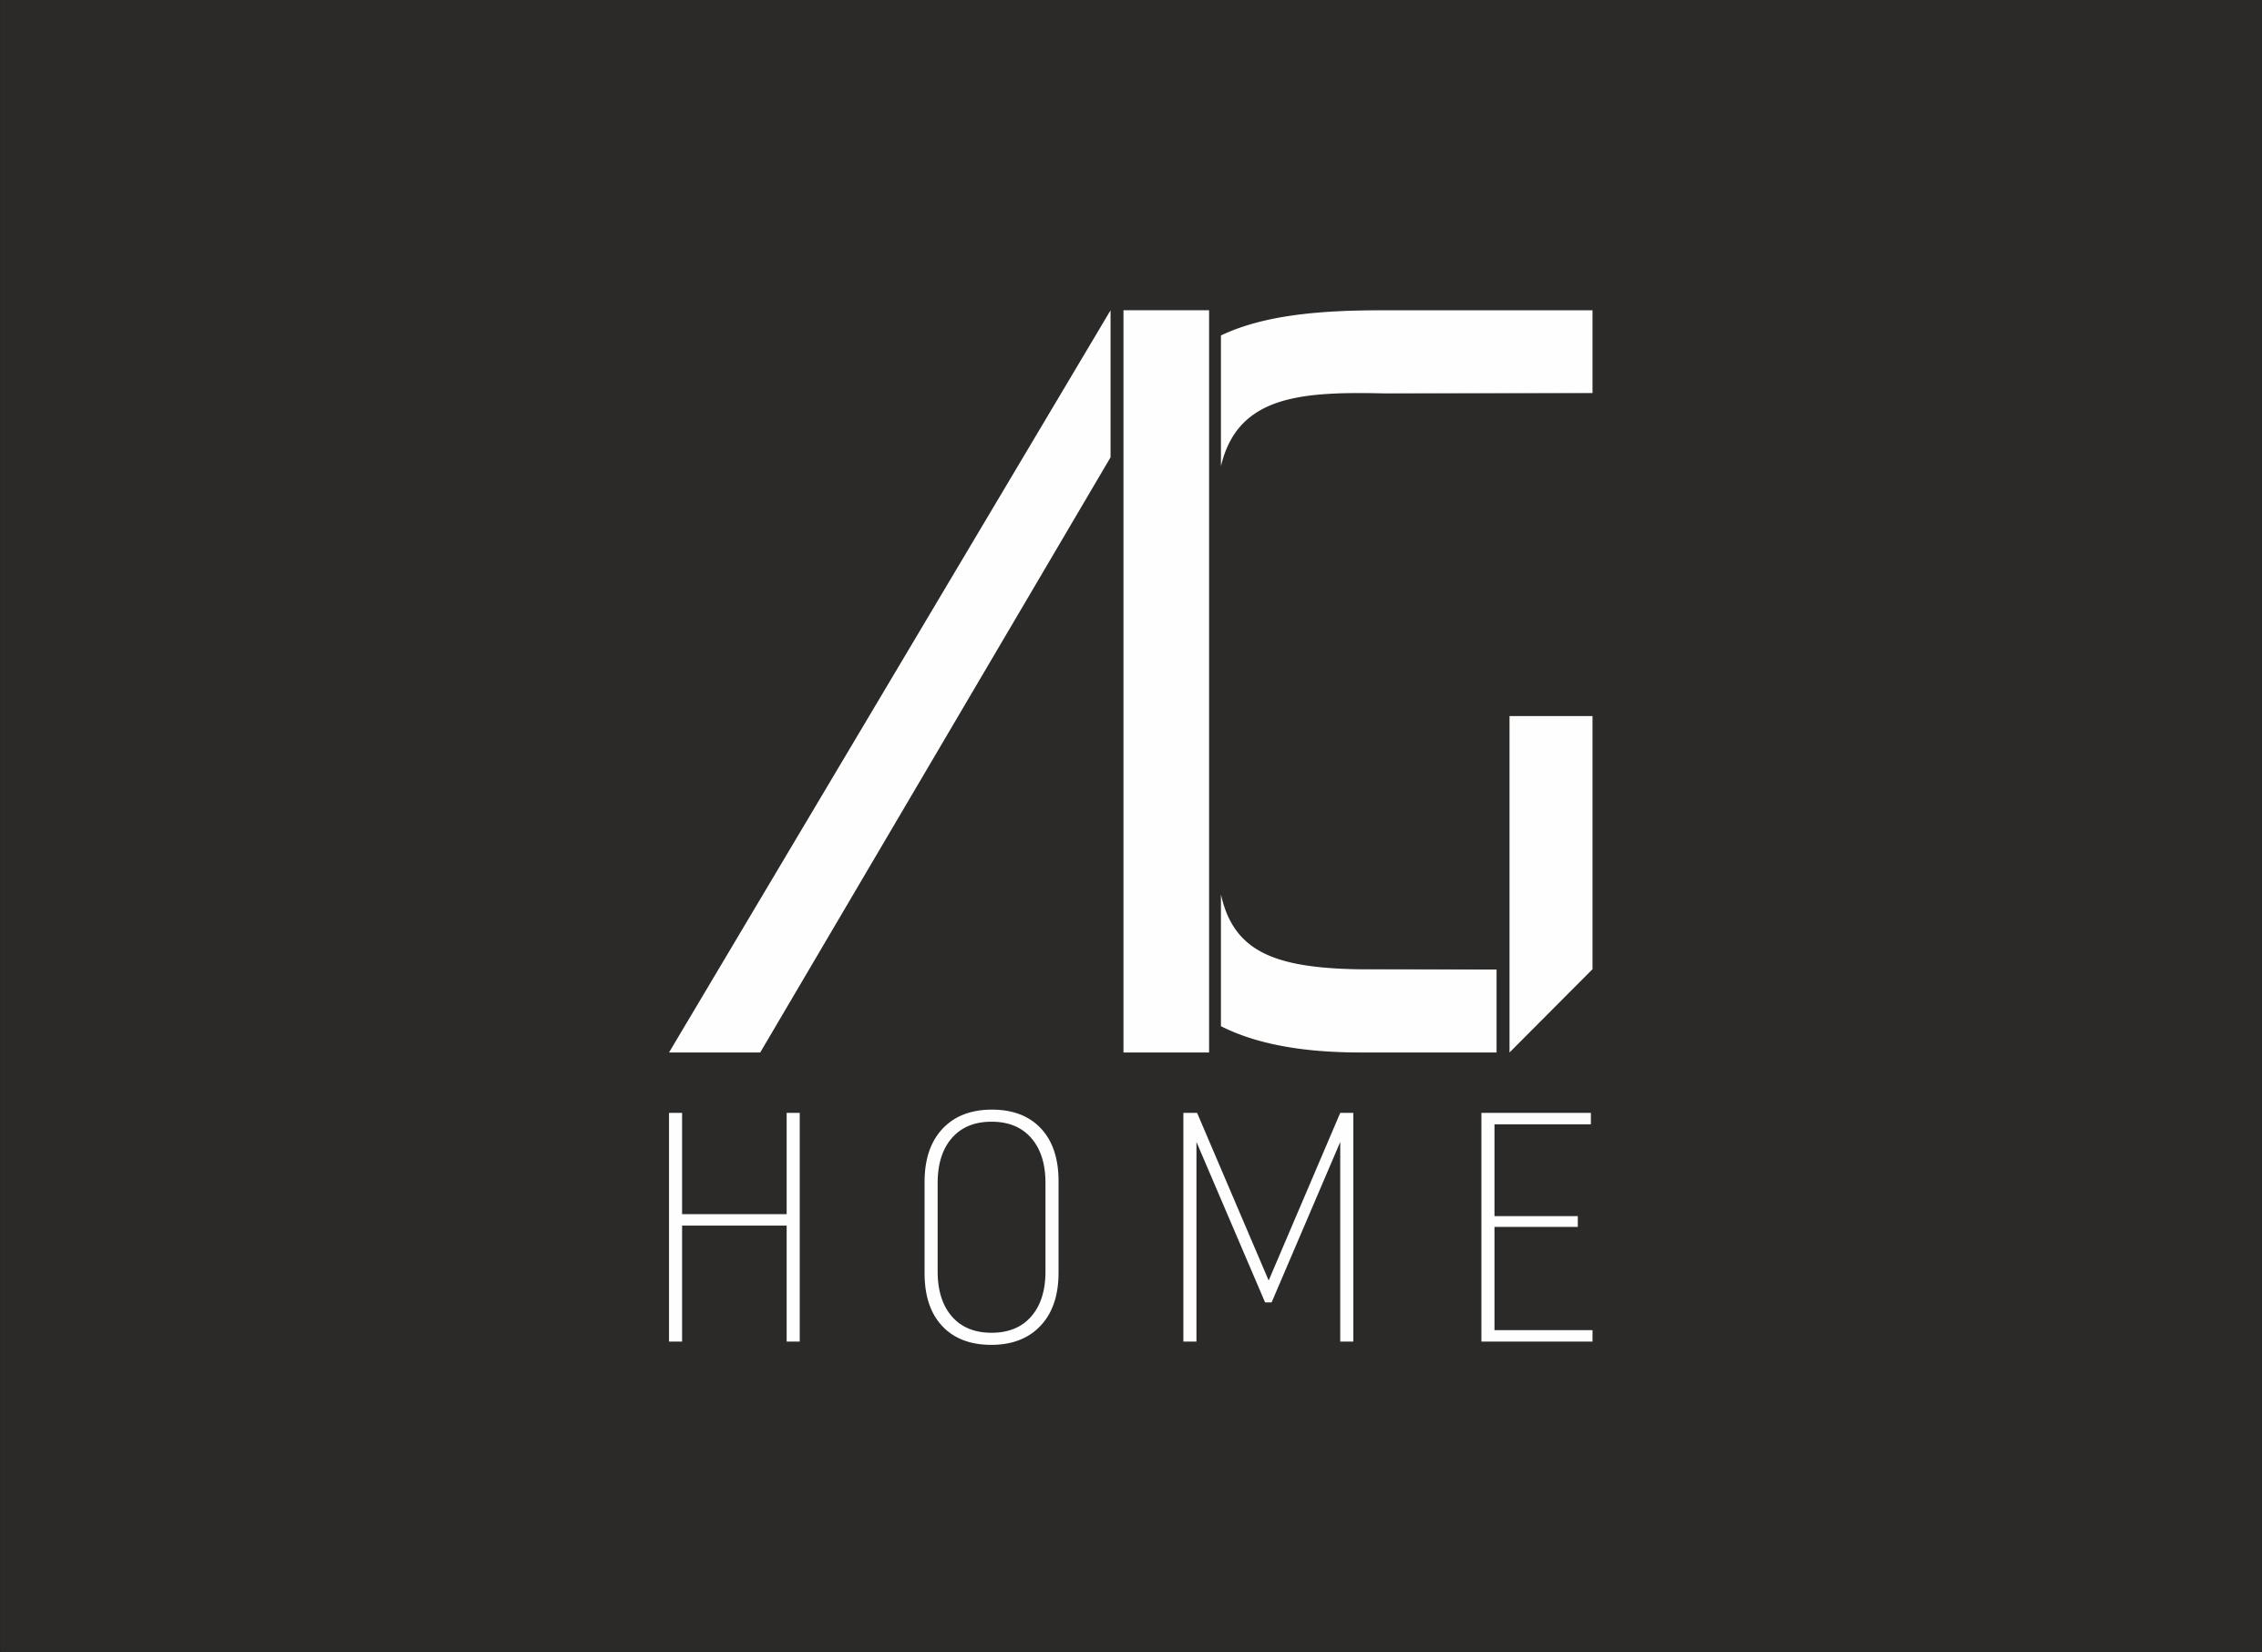 A&G HOME